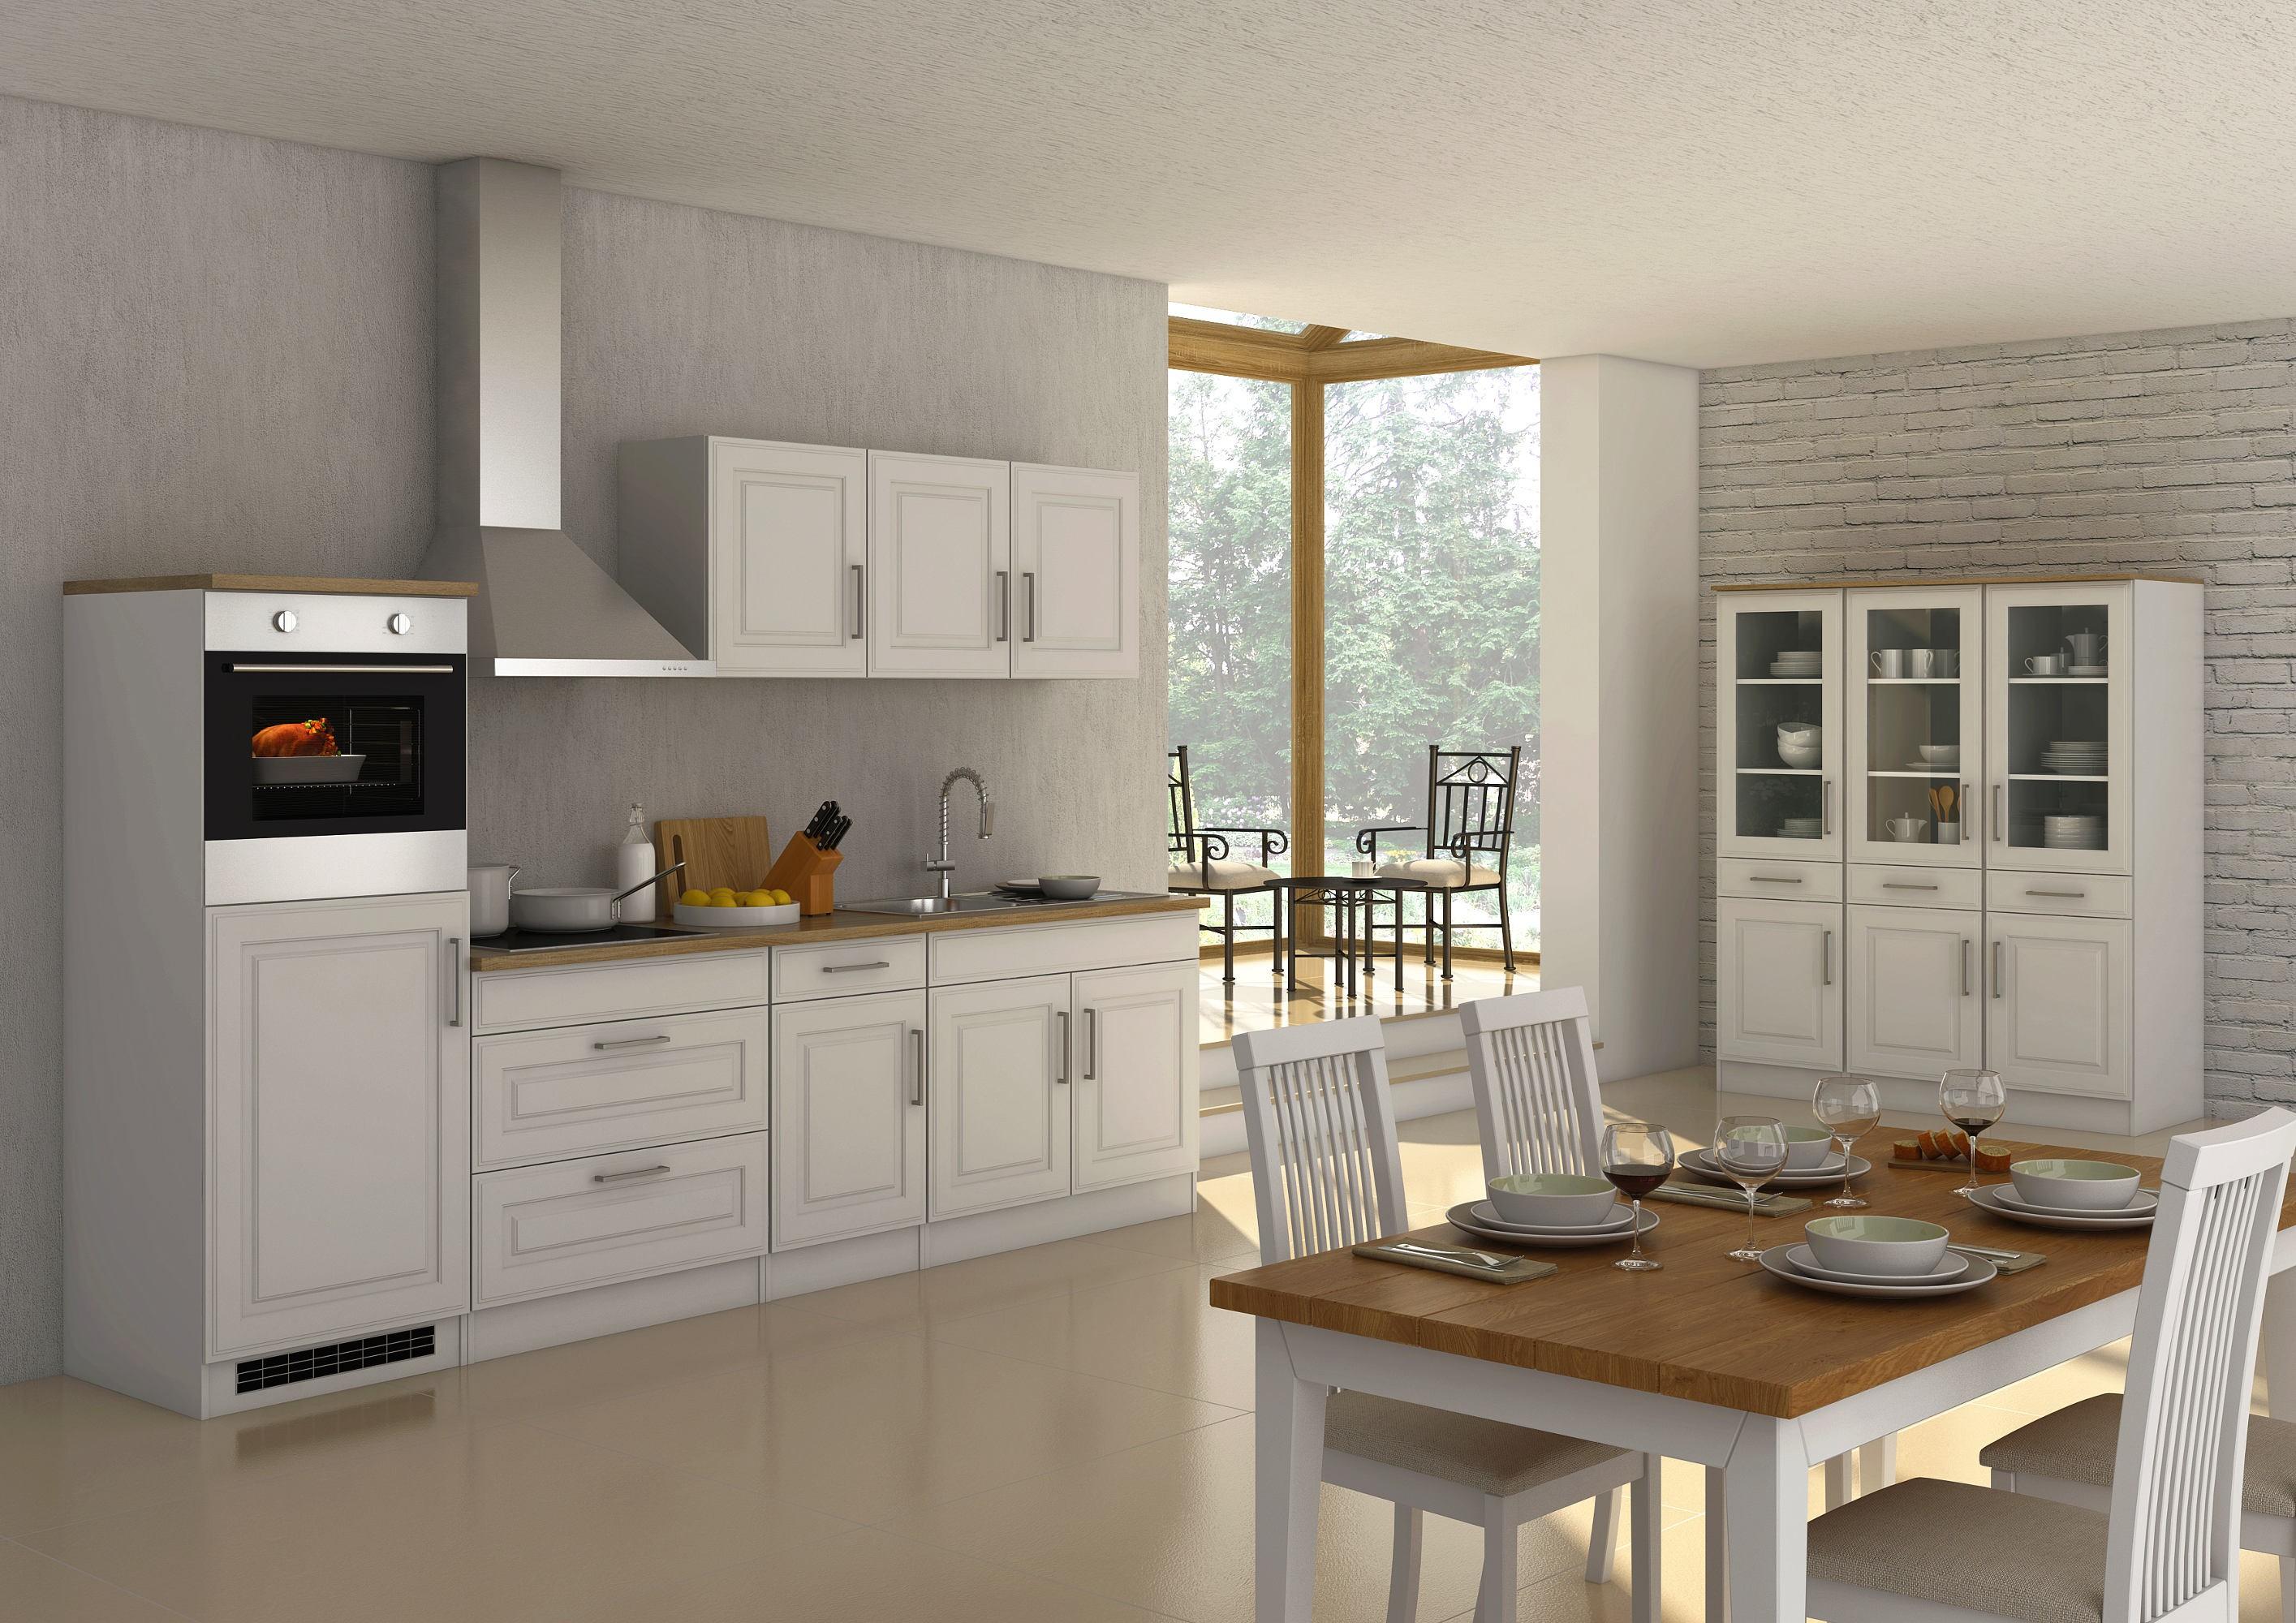 k chen h ngeschrank k ln 1 t rig breite 60 cm wei k che k chen h ngeschr nke. Black Bedroom Furniture Sets. Home Design Ideas